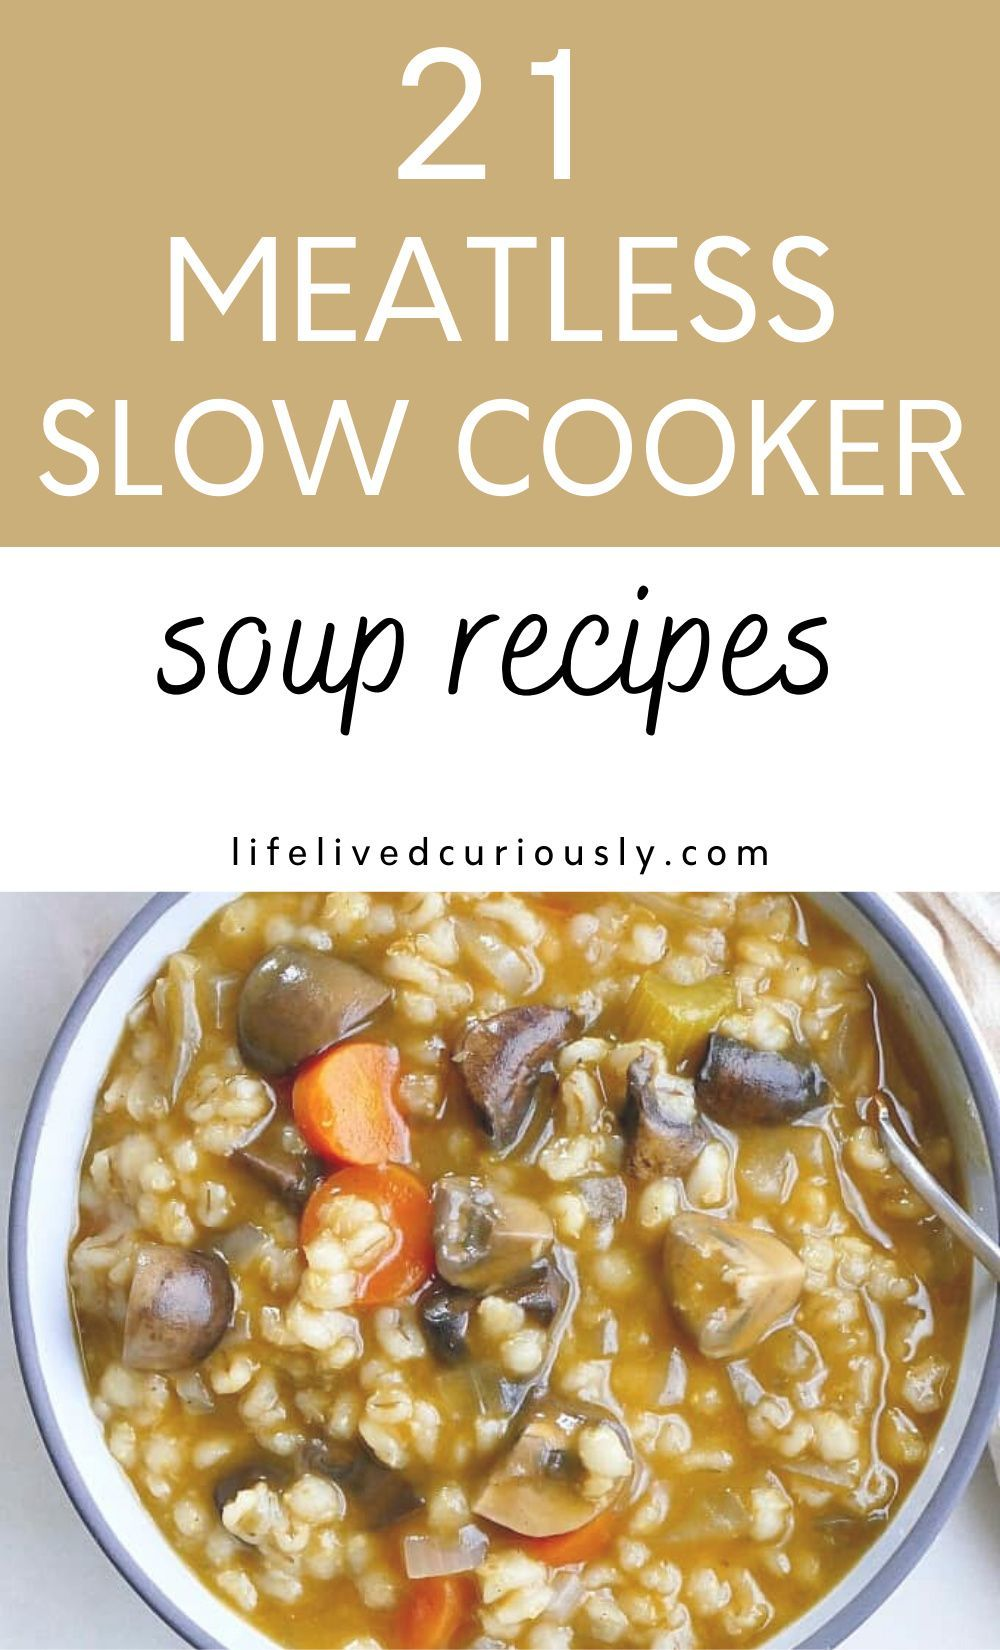 21 Crock Pot Vegetarian Soup Recipes Life Lived Curiously In 2020 Vegetarian Crockpot Recipes Vegetarian Crockpot Vegetarian Soup Recipes